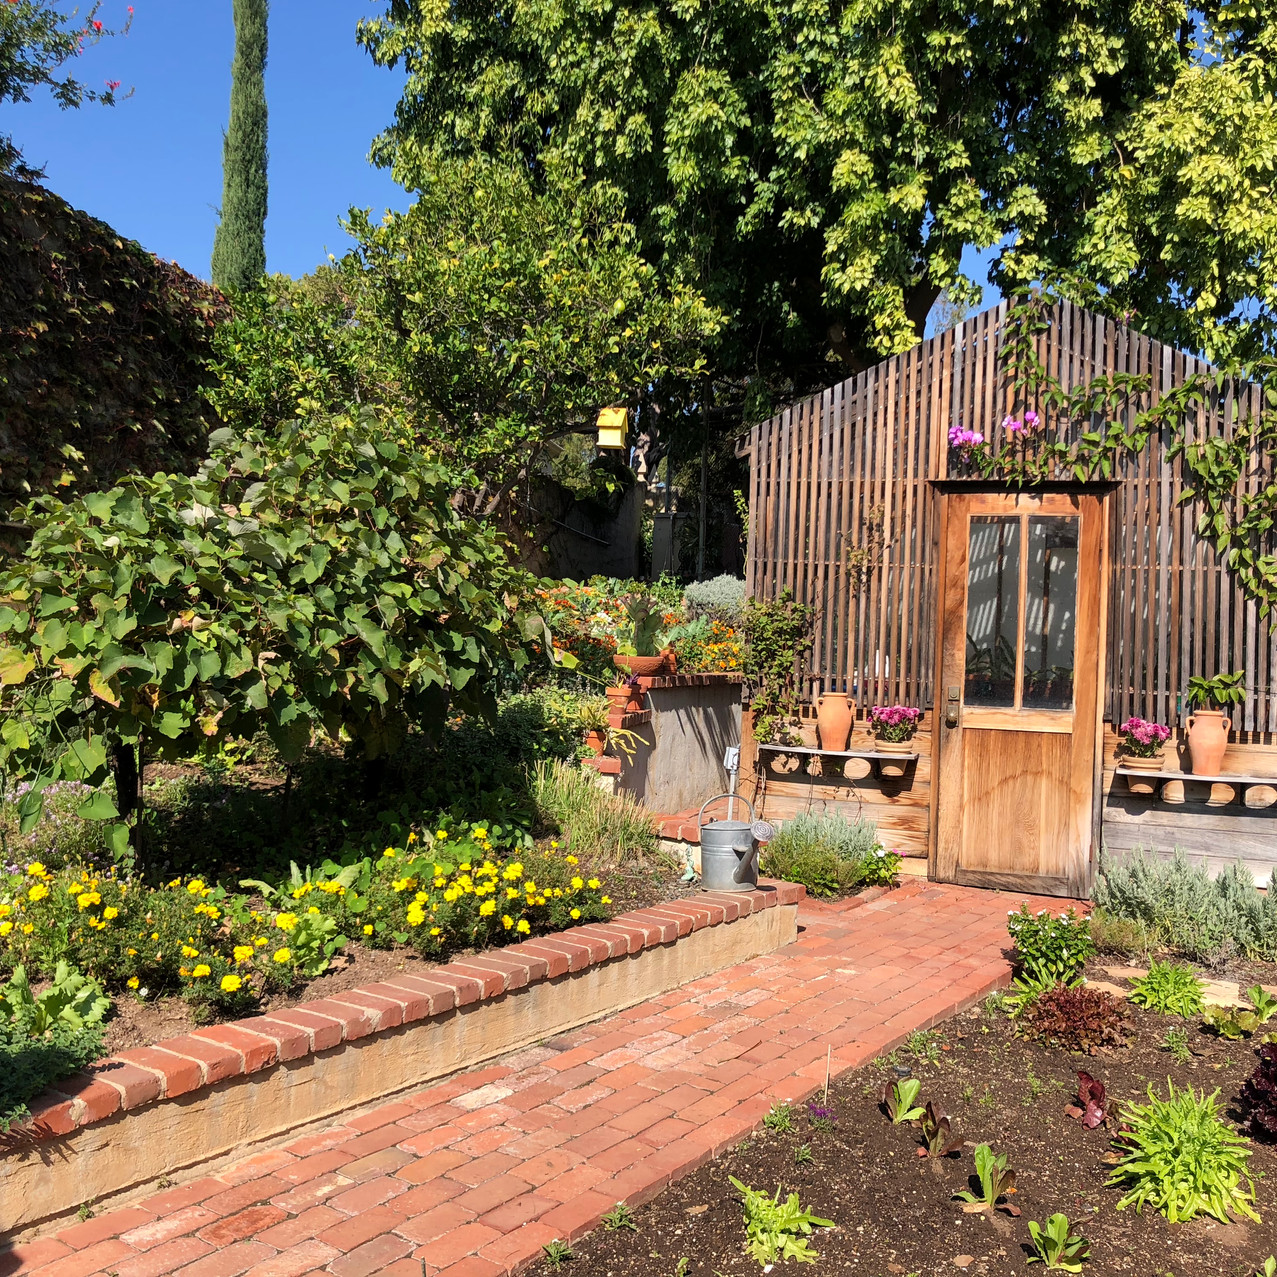 Robinson Gardens Oct 2018 - 11